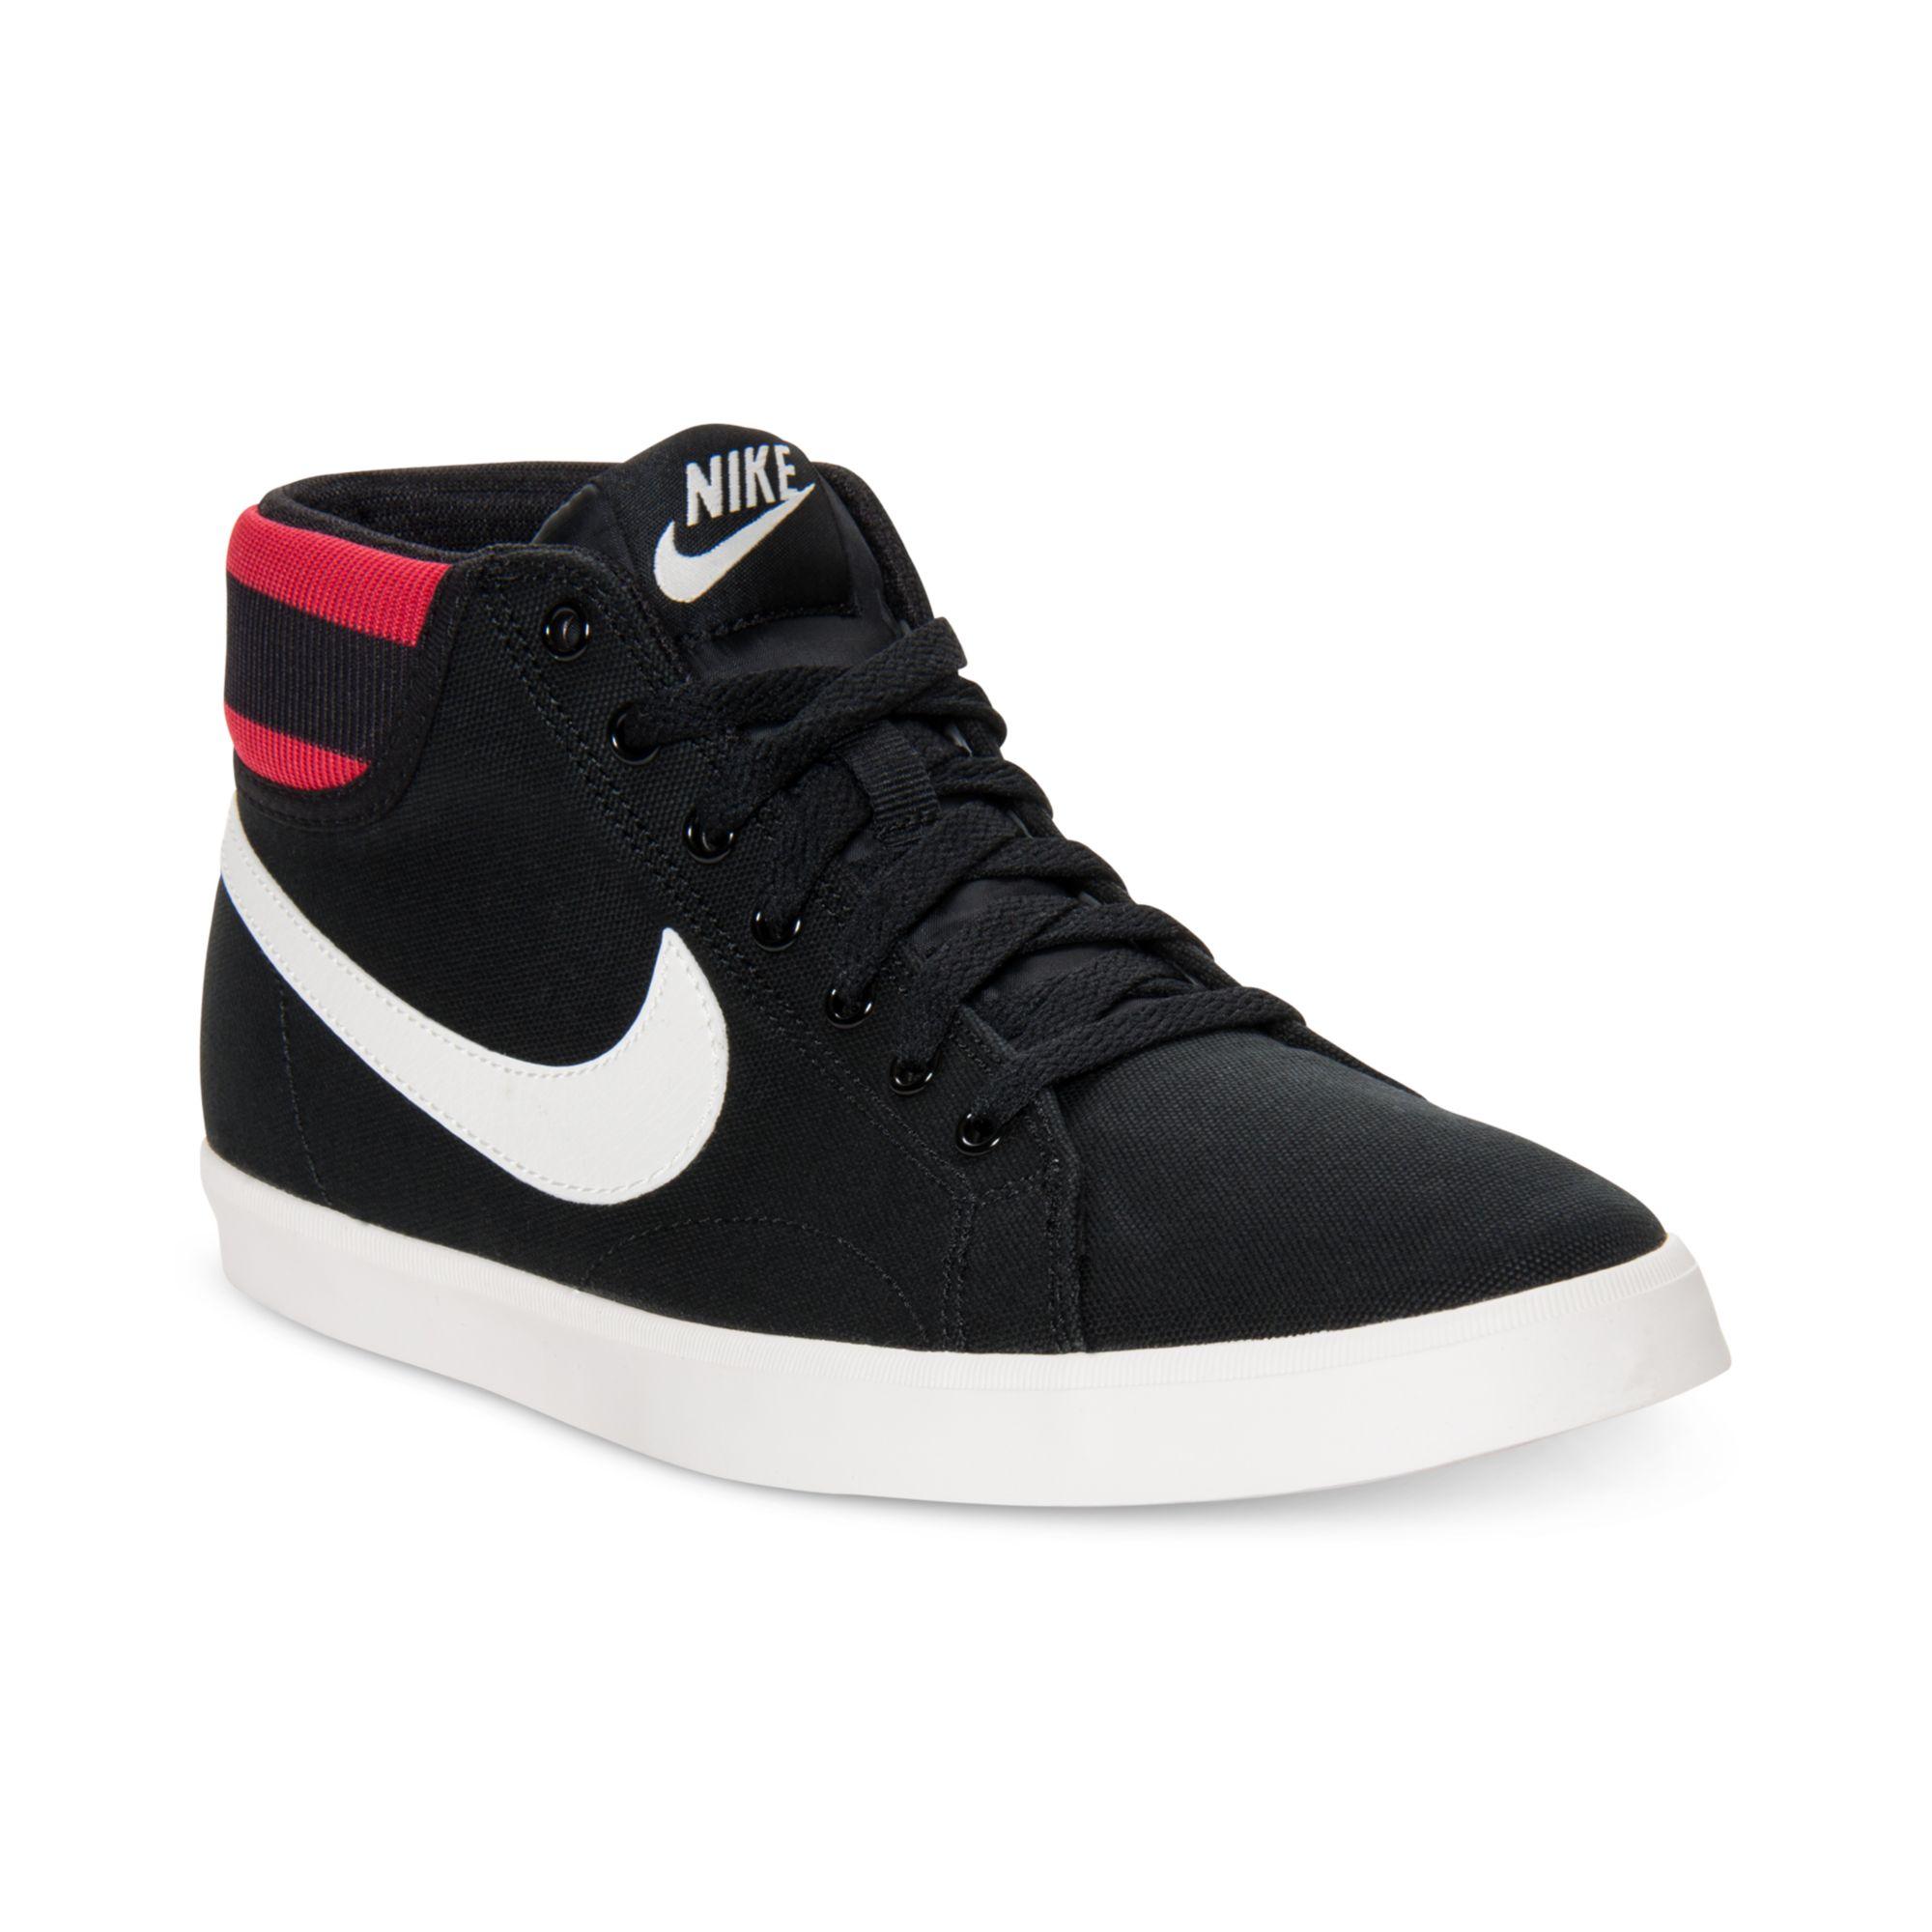 72e4e393b791d ... shop lyst nike eastham mid trainer sneakers in black for men 1de31 d7ff2